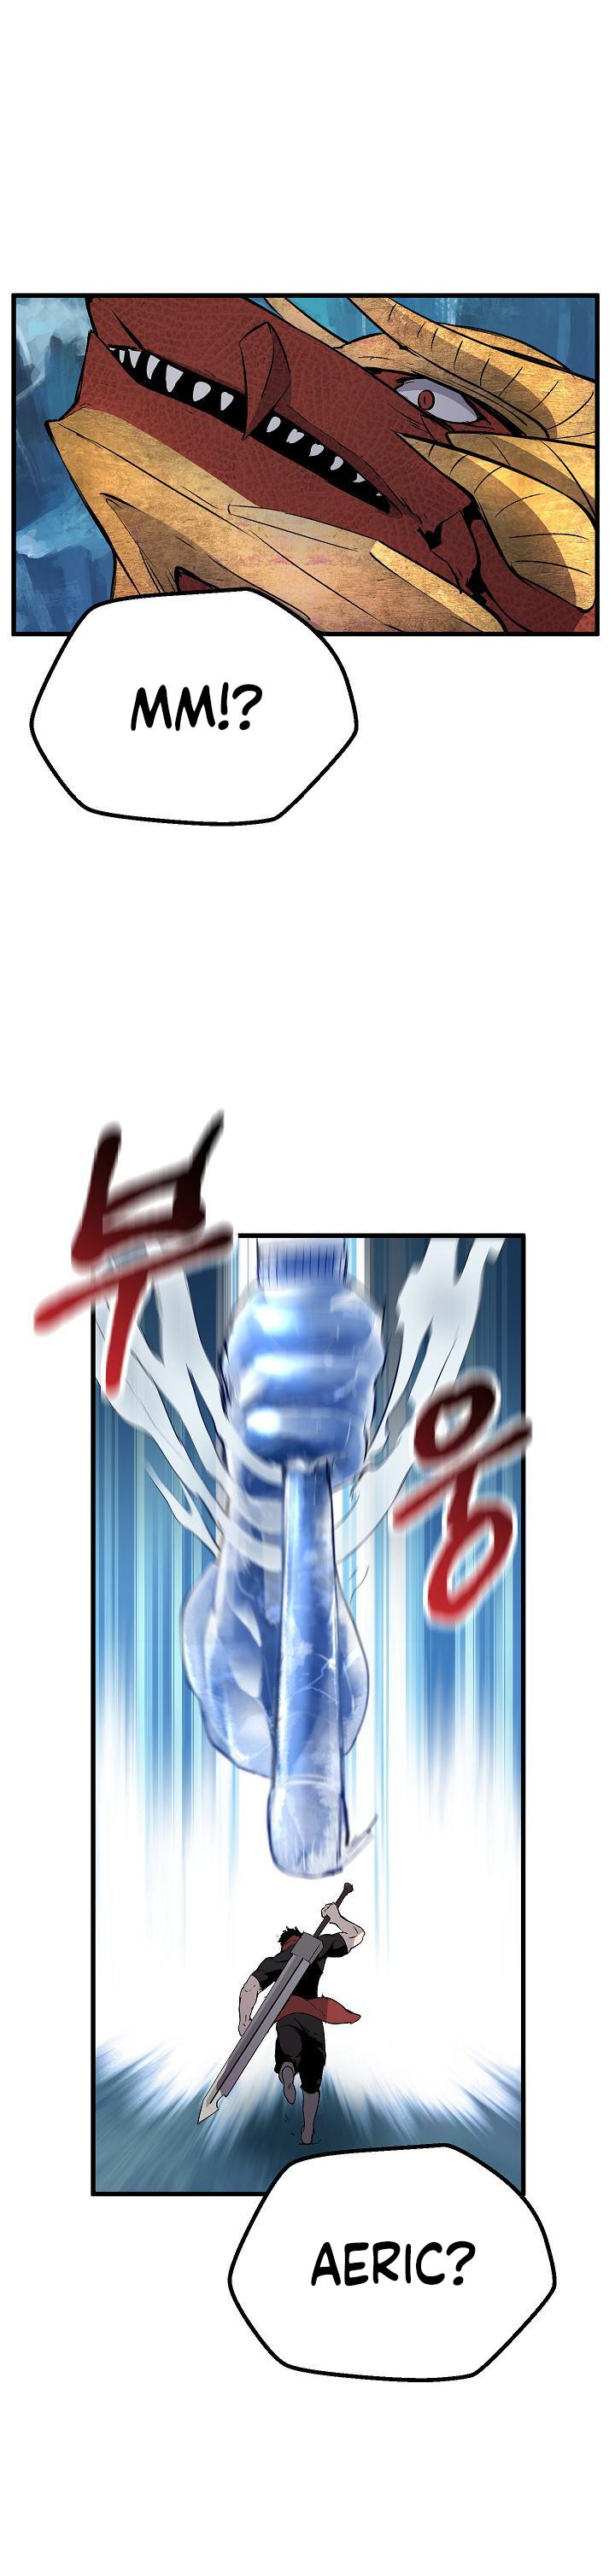 Survival Story Of A Sword King In A Fantasy World Vol.1 Chapter 19 page 21 - Mangakakalots.com